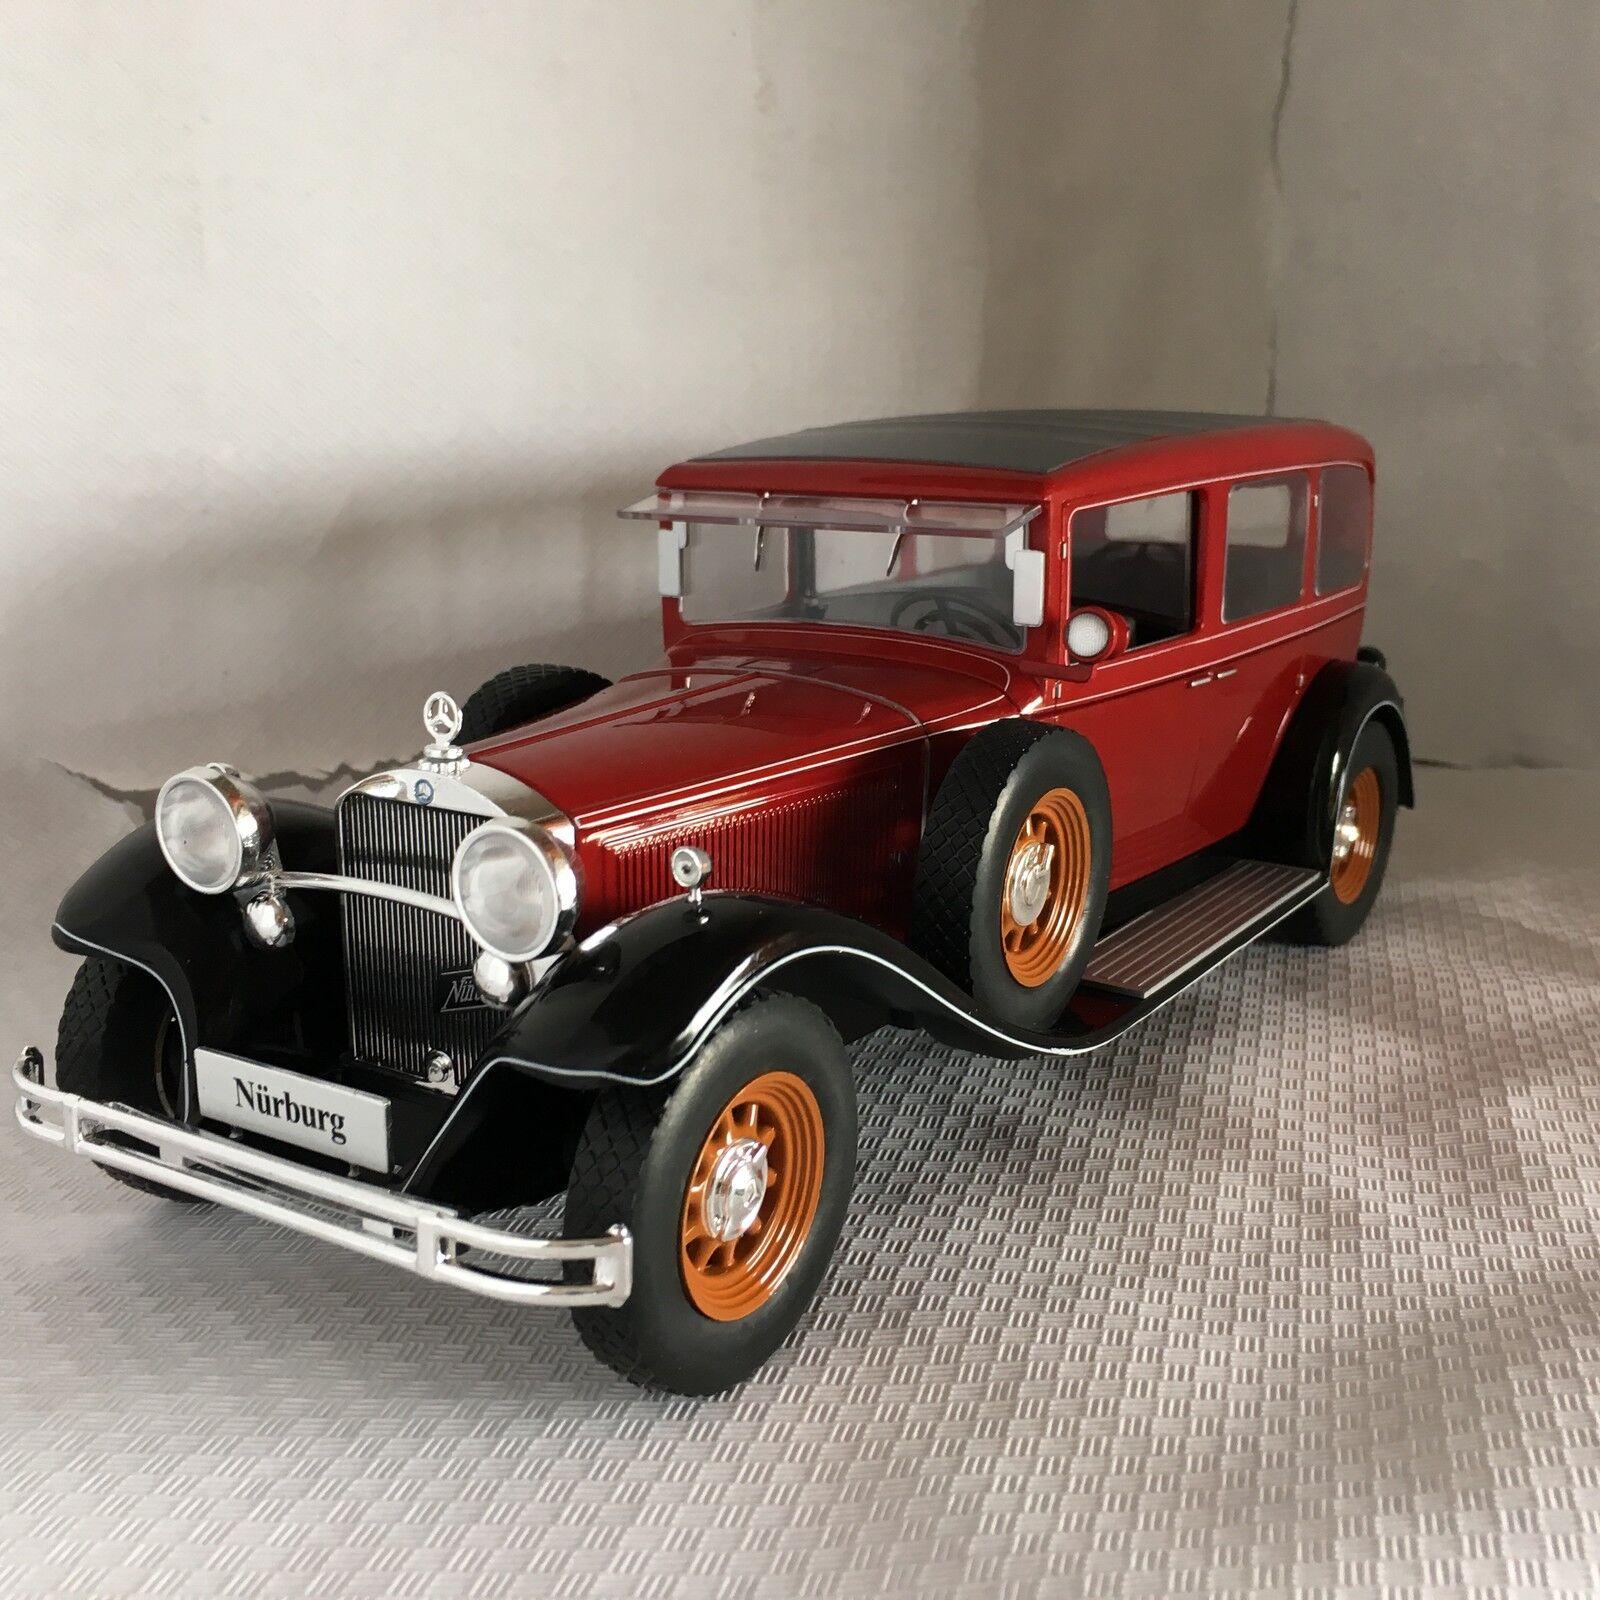 Mercedes tipo Nürburg 460 460 K rosso oscuro nero 1 18 microg nuevo con embalaje original mcg18032